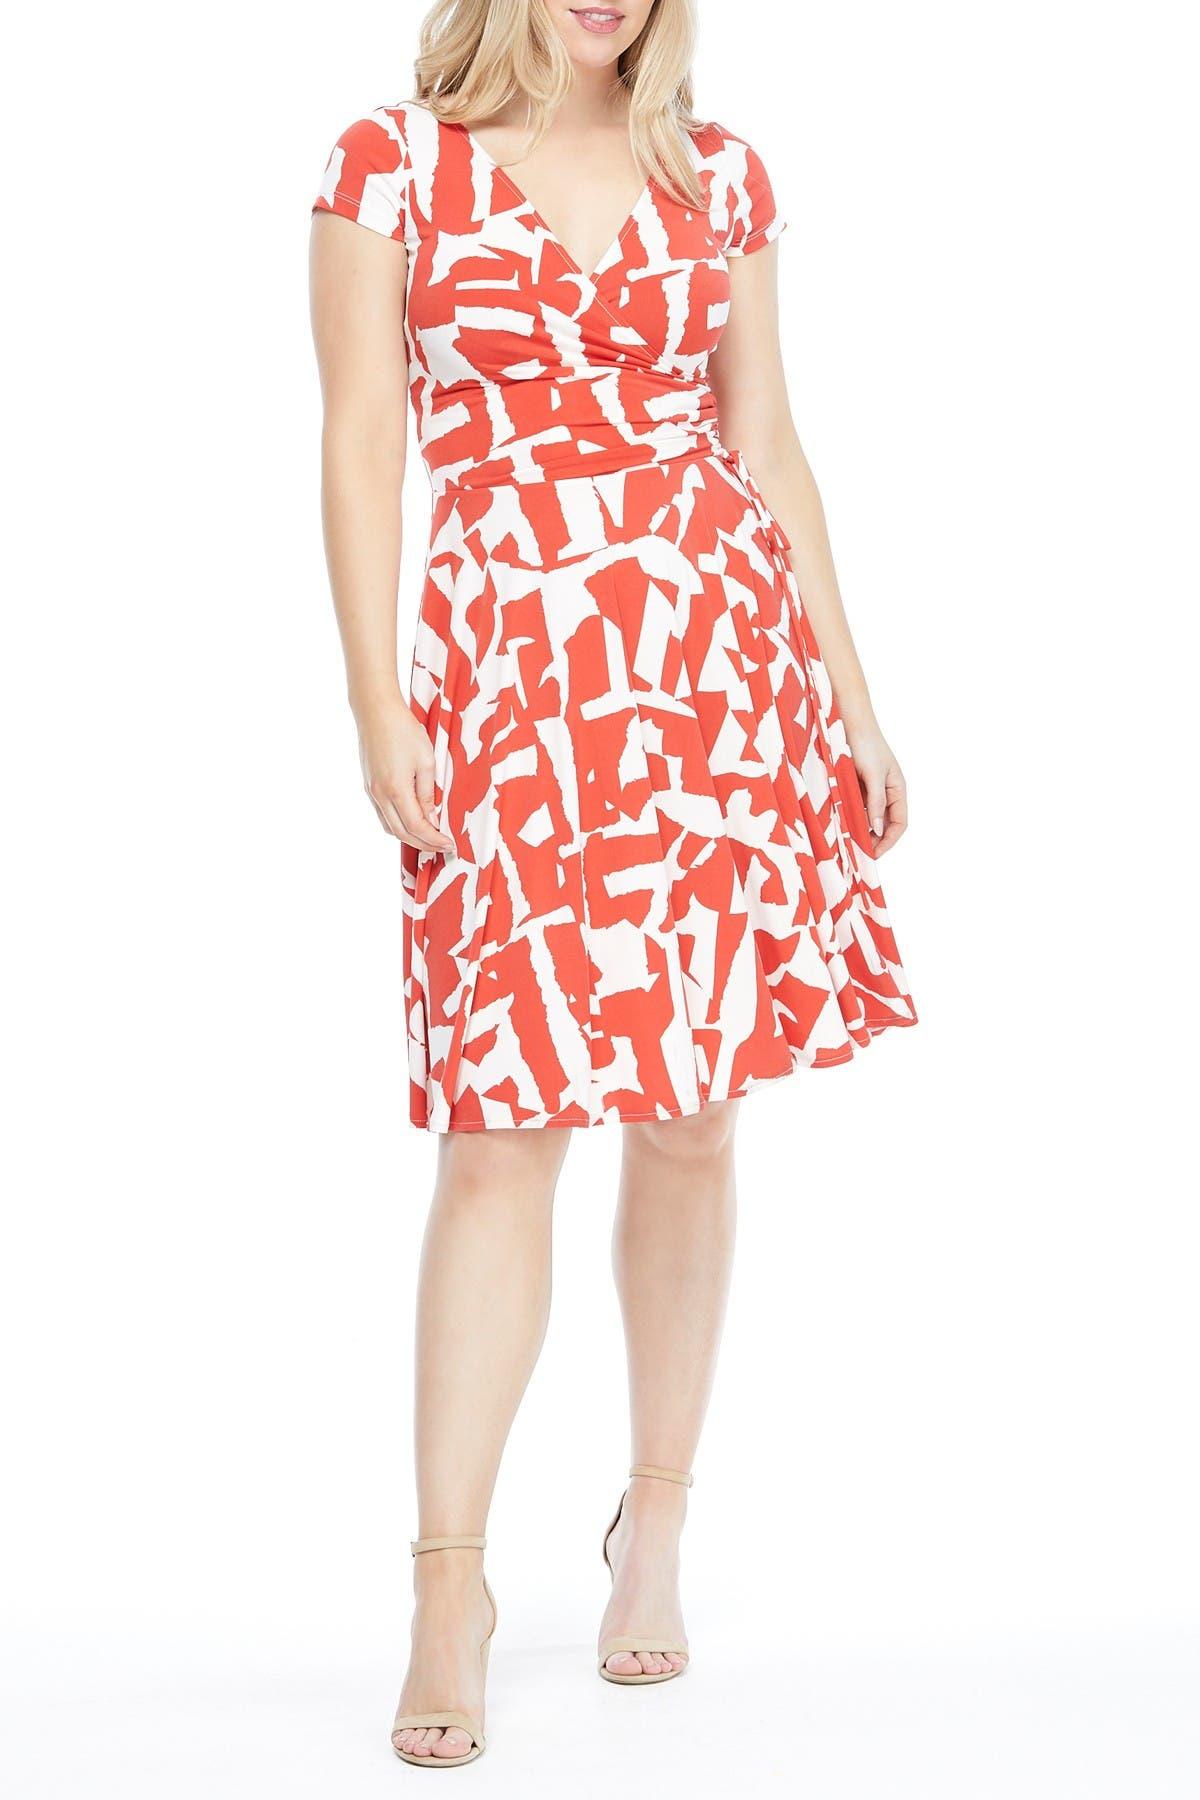 Image of Maggy London Geometric Print Surplice Neck Wrap Dress